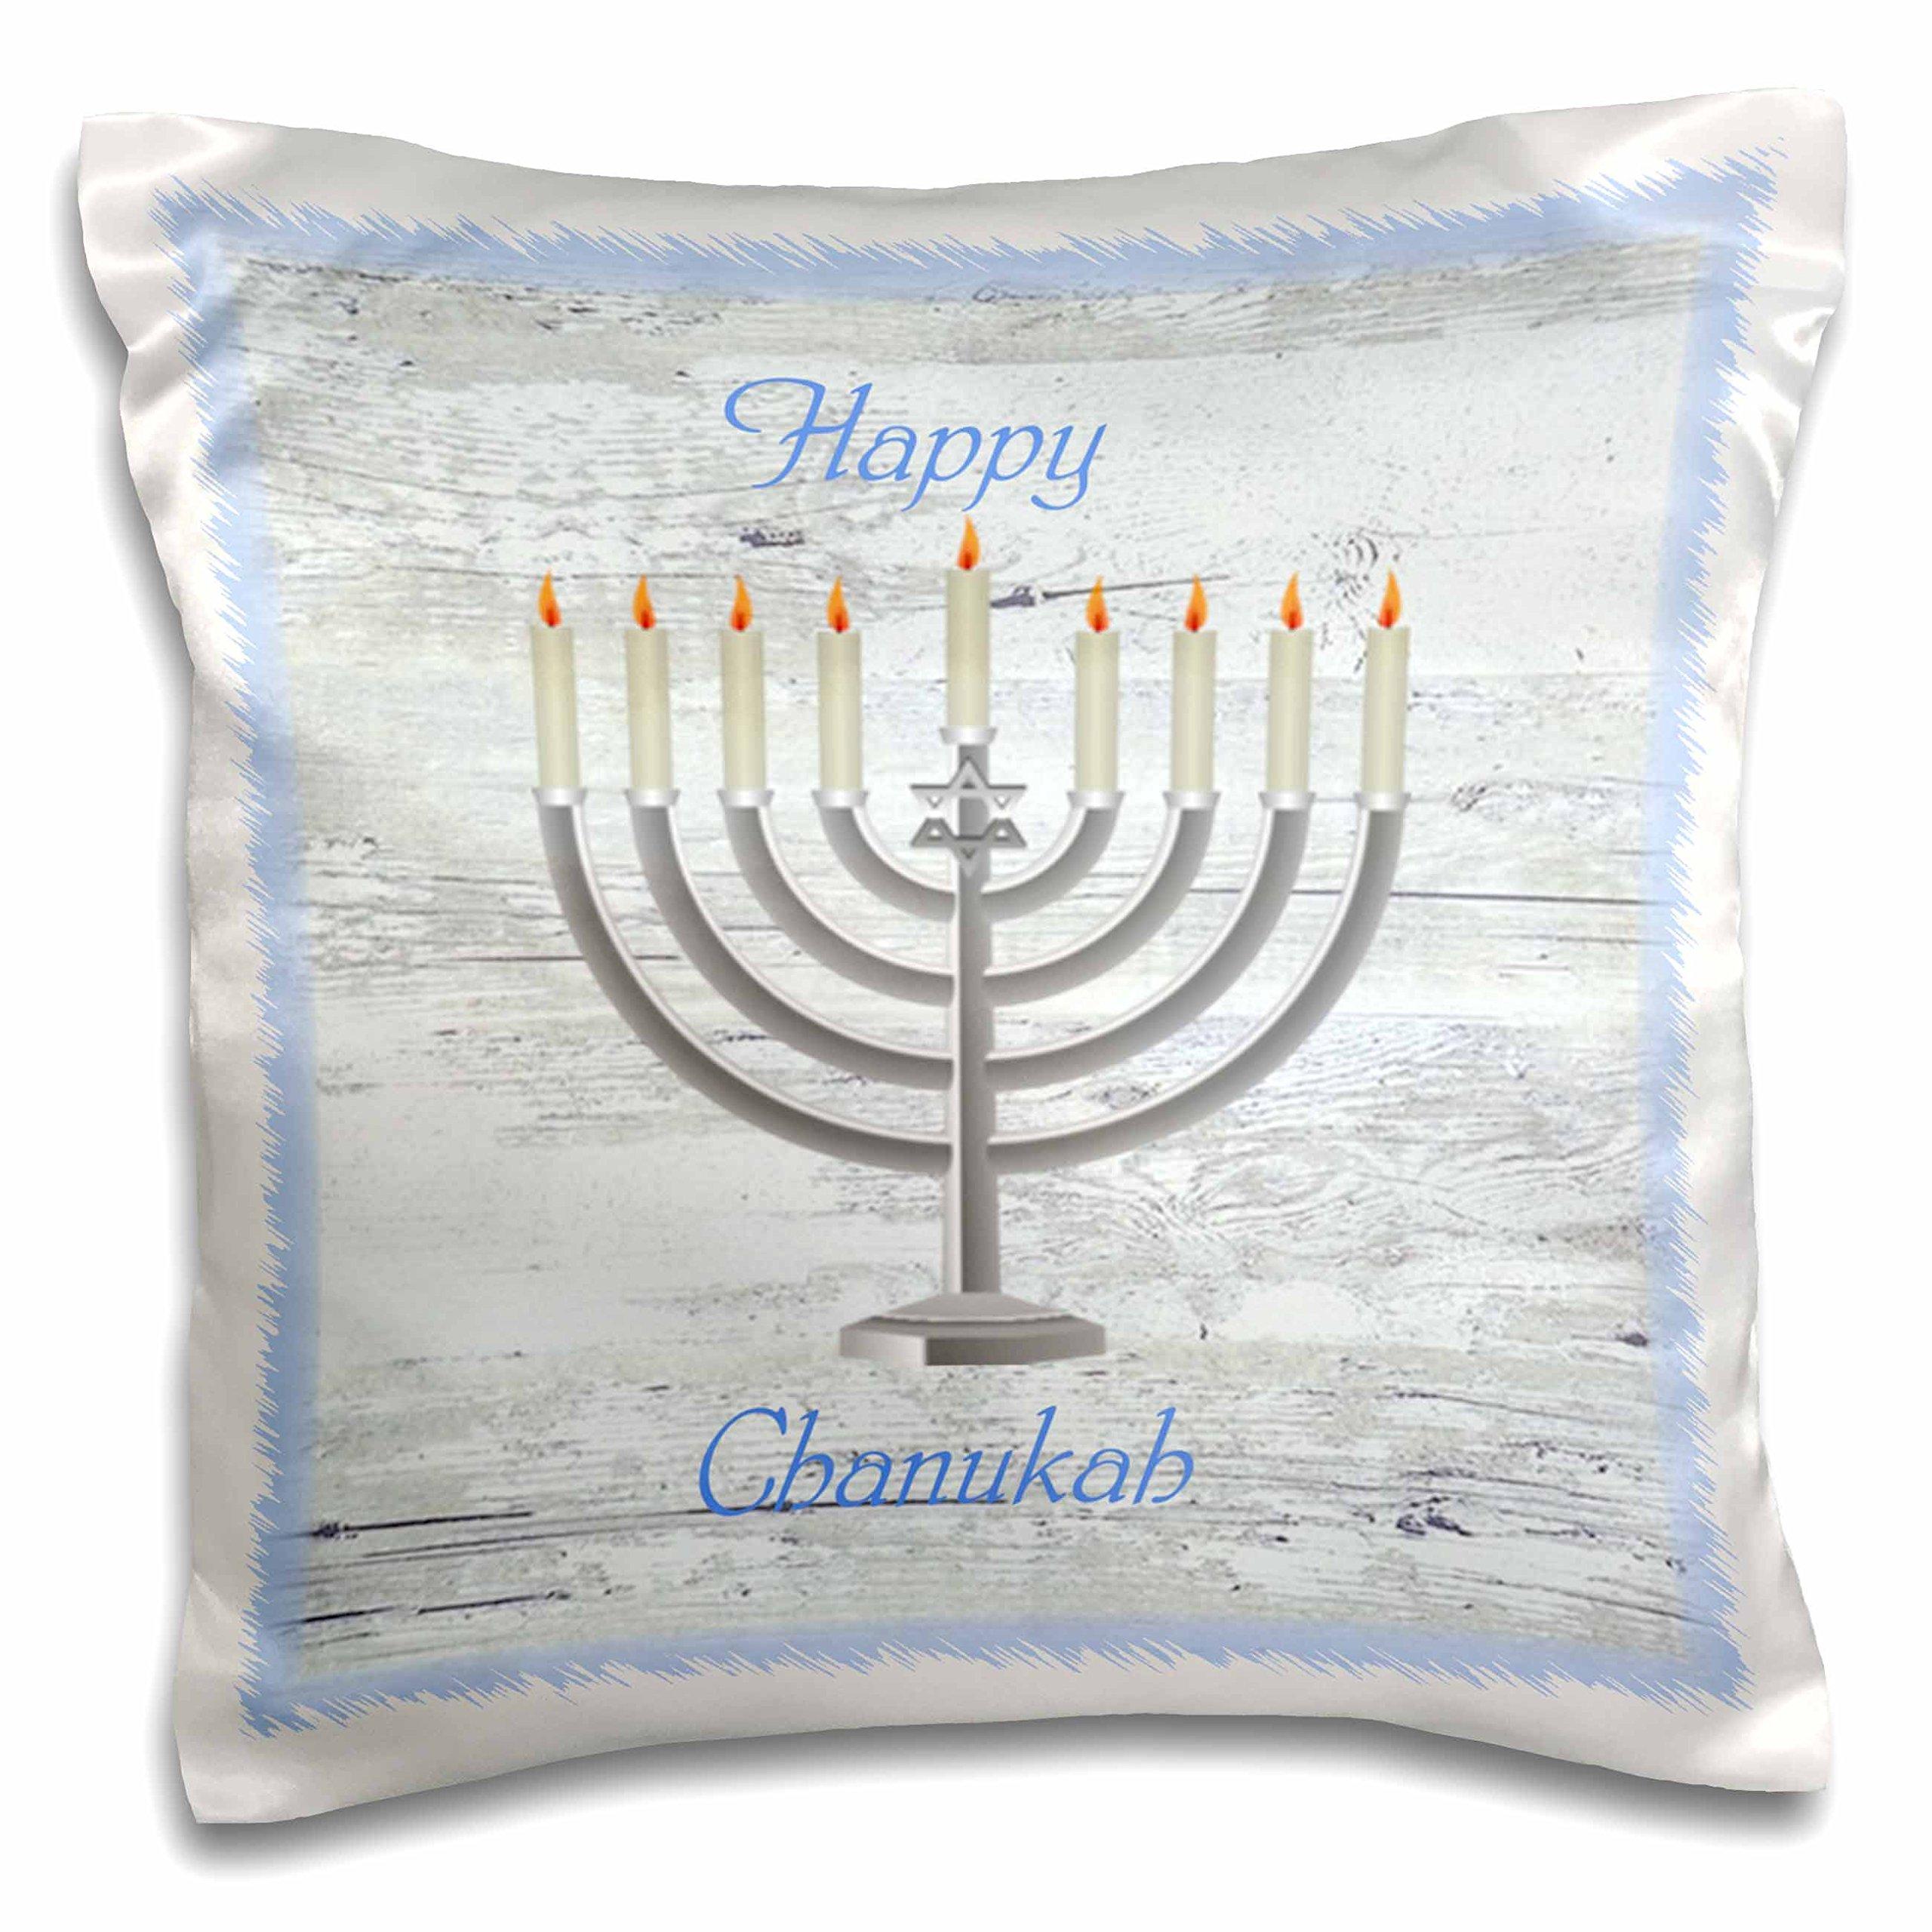 3D Rose Image of Chanukah Menorah on White Washed Wood Pillow Case, 16'' x 16''